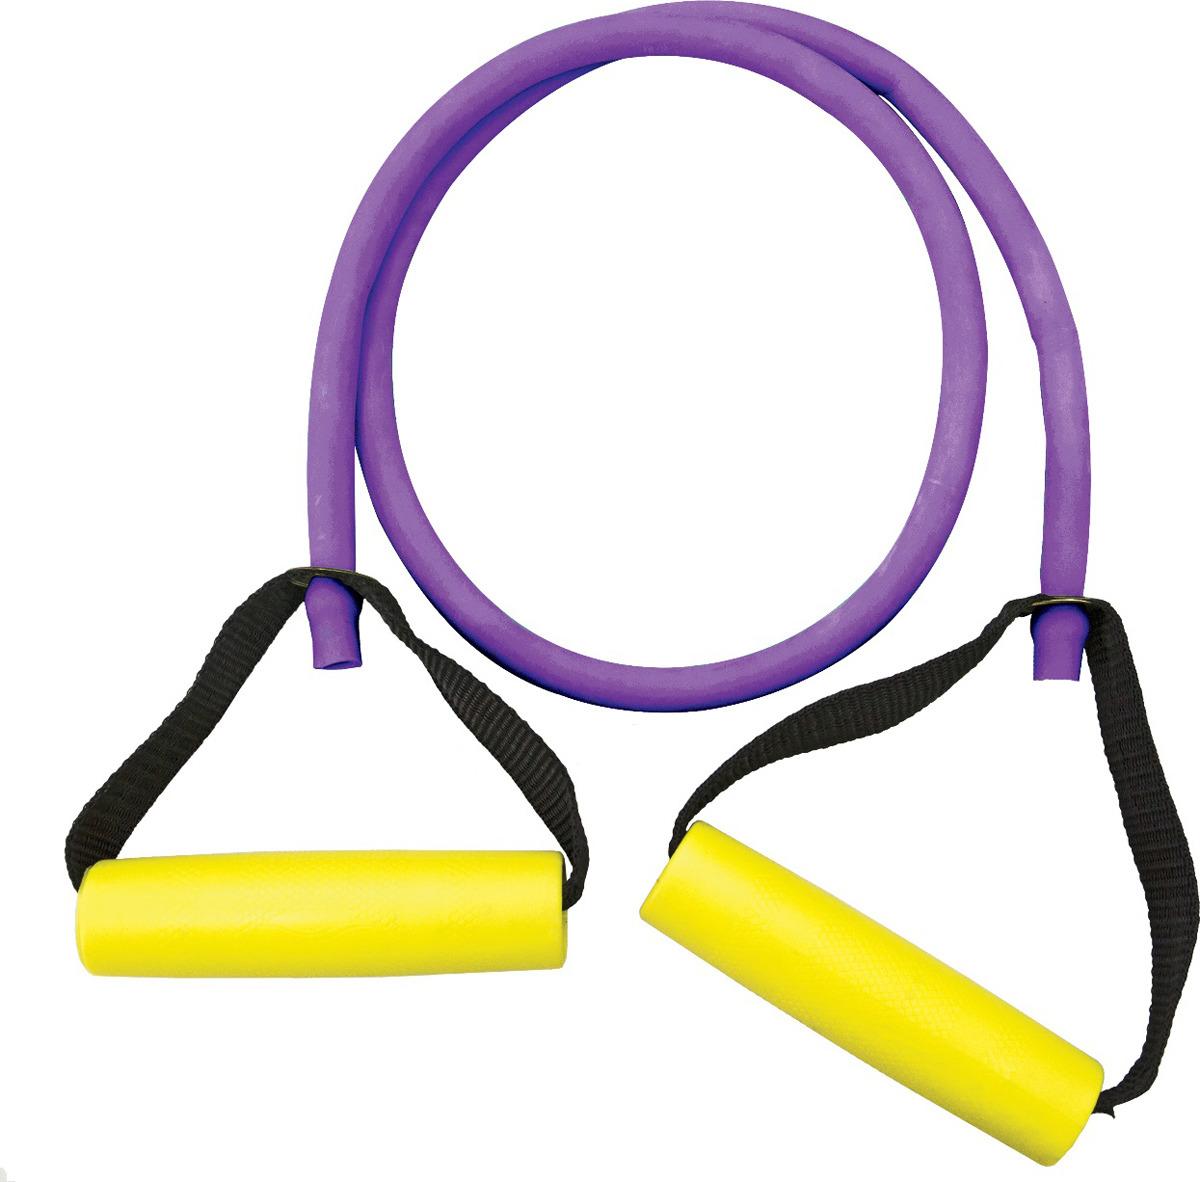 Эспандер Absolute Champion Т-2, 4690337034197, фиолетовый, для груди, 1 м эспандер absolute champion с разборной ручкой